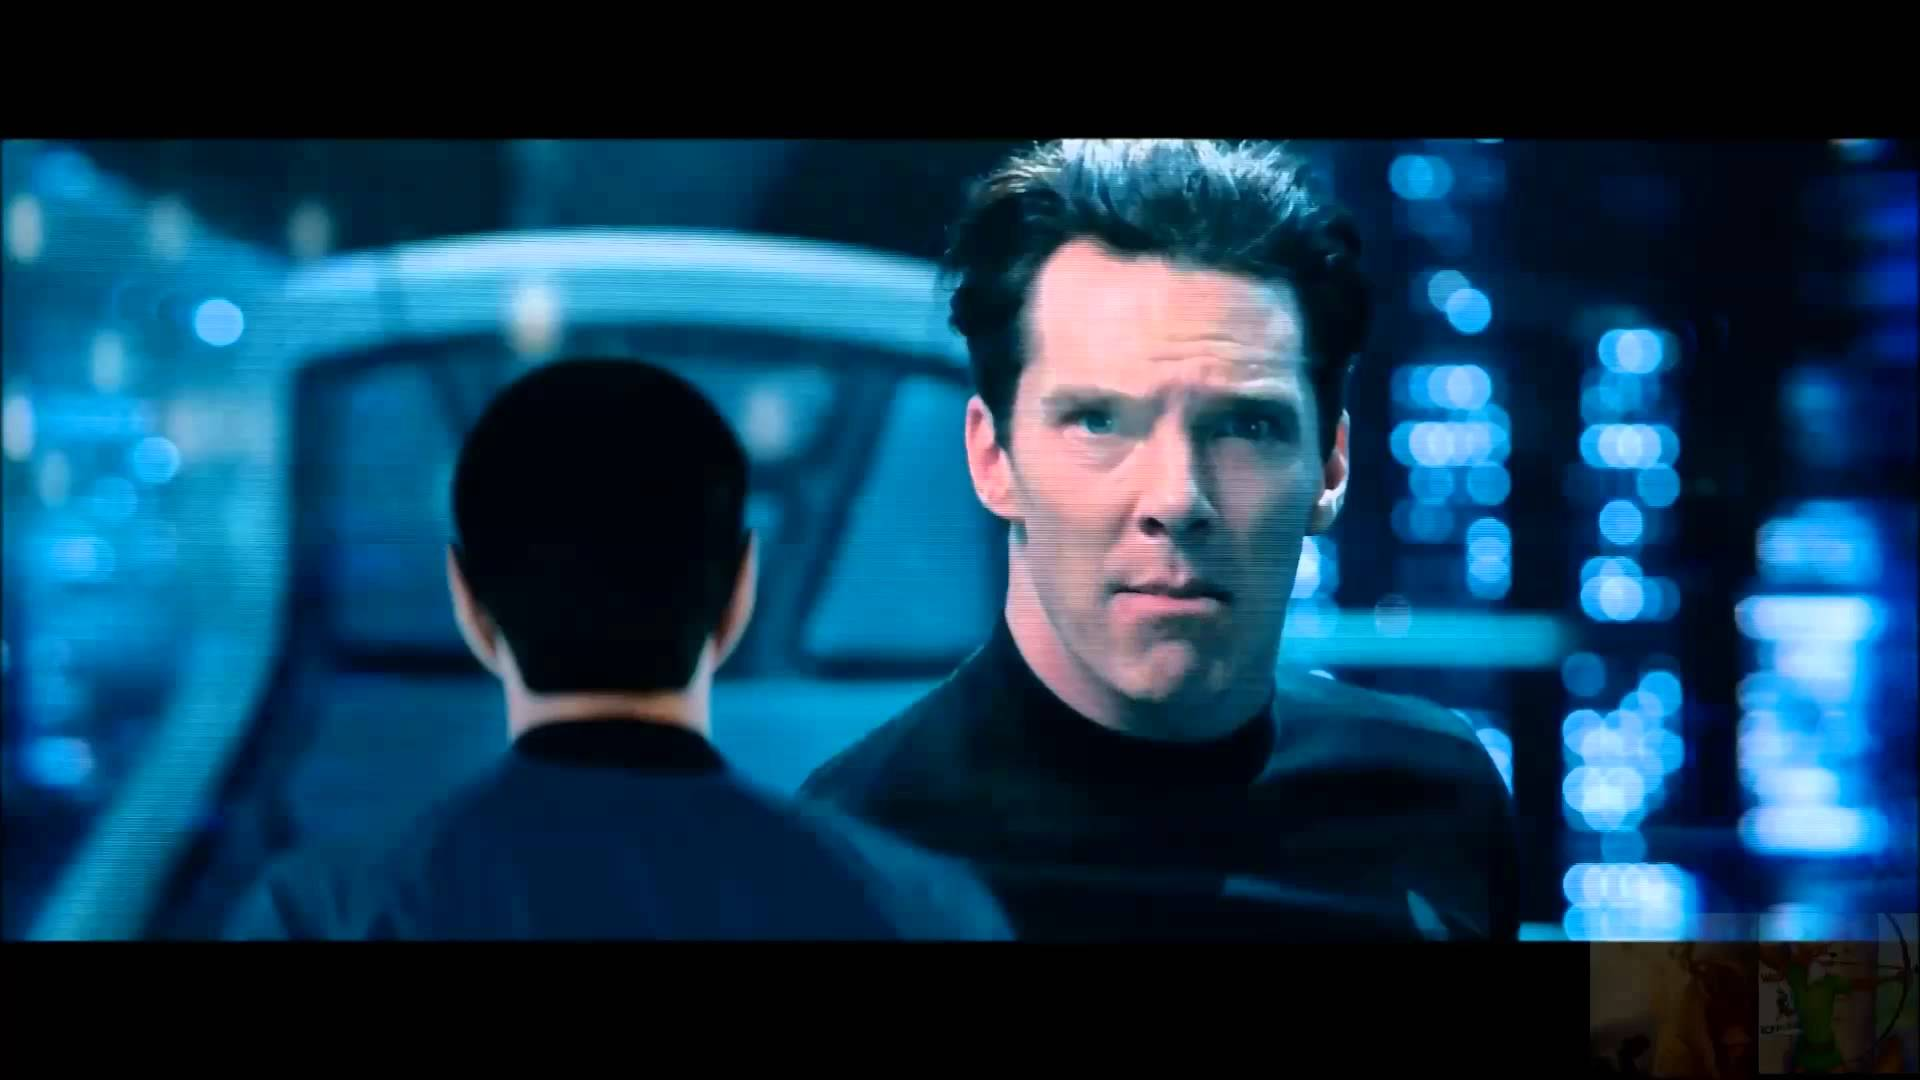 Star Trek Into Darkness Wallpapers Movie Hq Star Trek Into